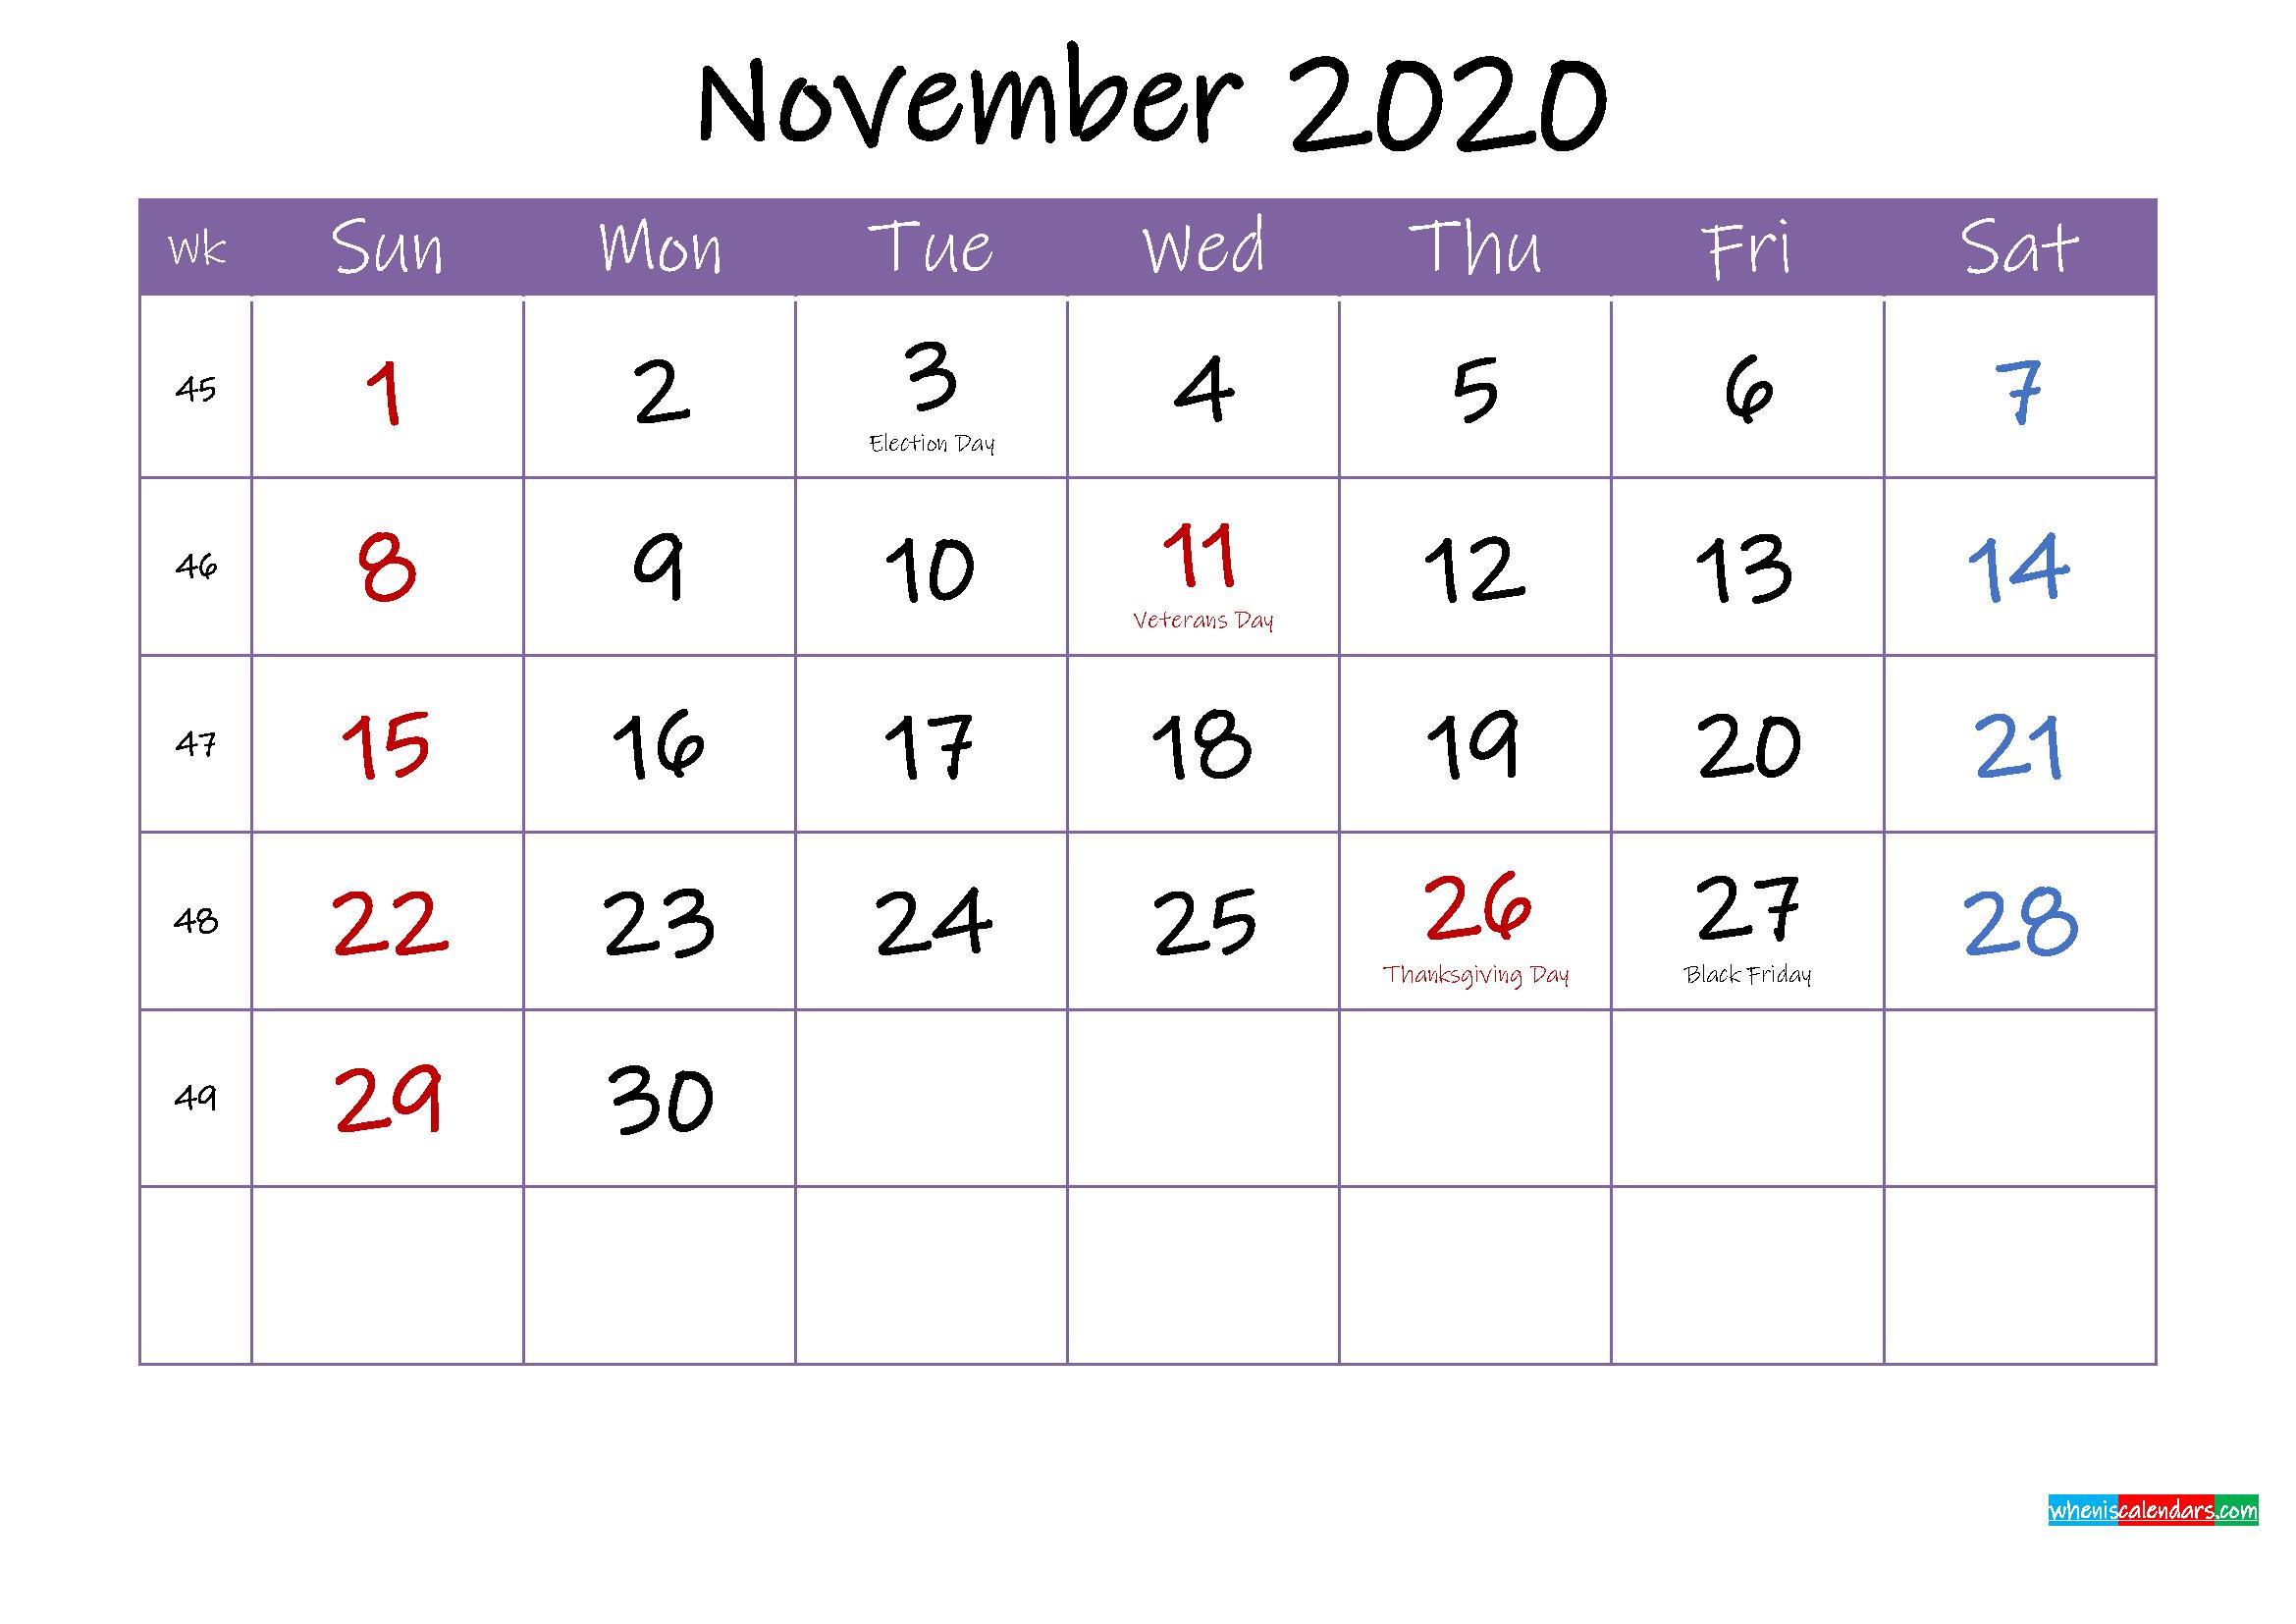 November 2020 Calendar with Holidays Printable